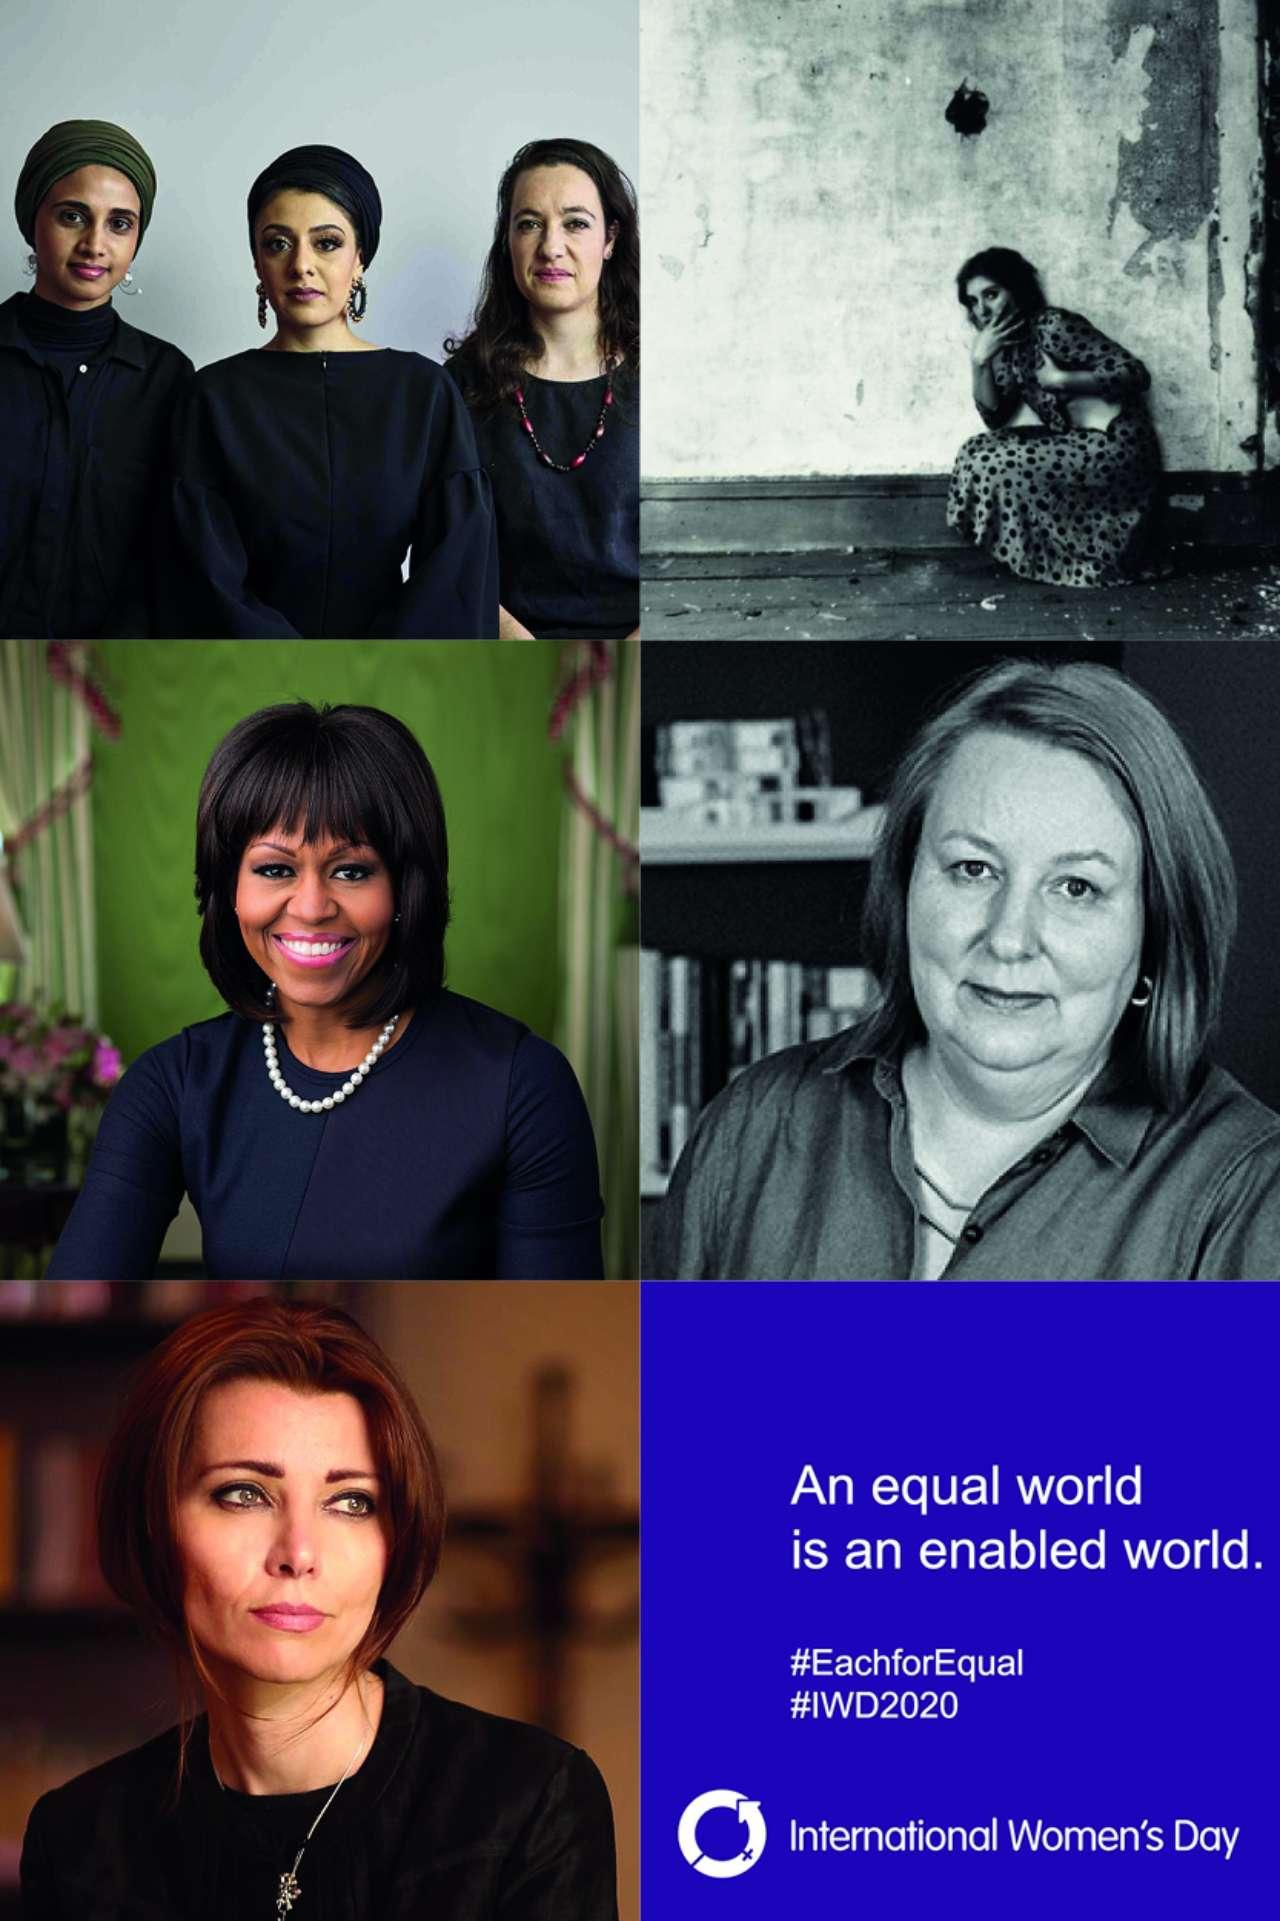 Inspired by Women